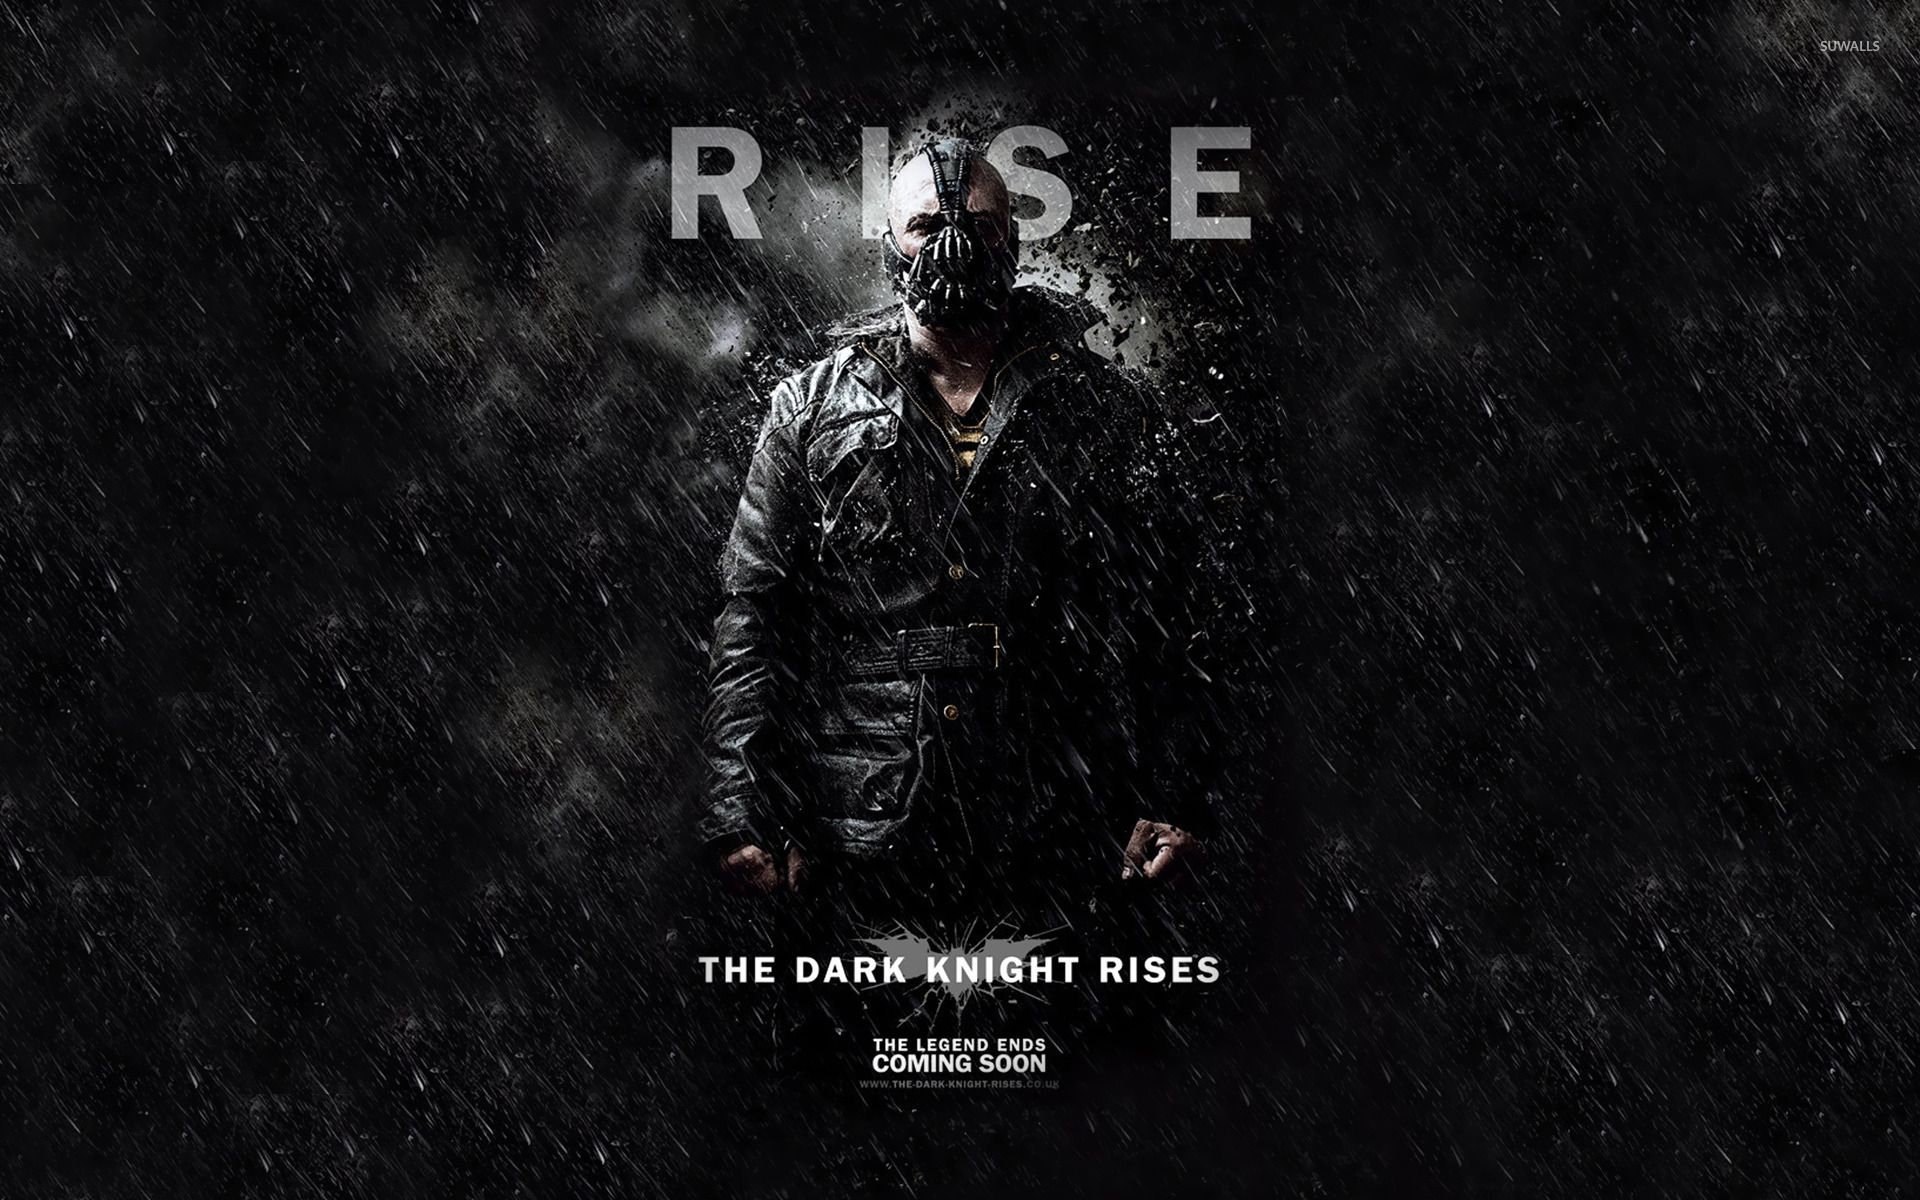 Batman in the dark knight rises wallpaper hd wallpapers pinterest batman in the dark knight rises wallpaper voltagebd Images